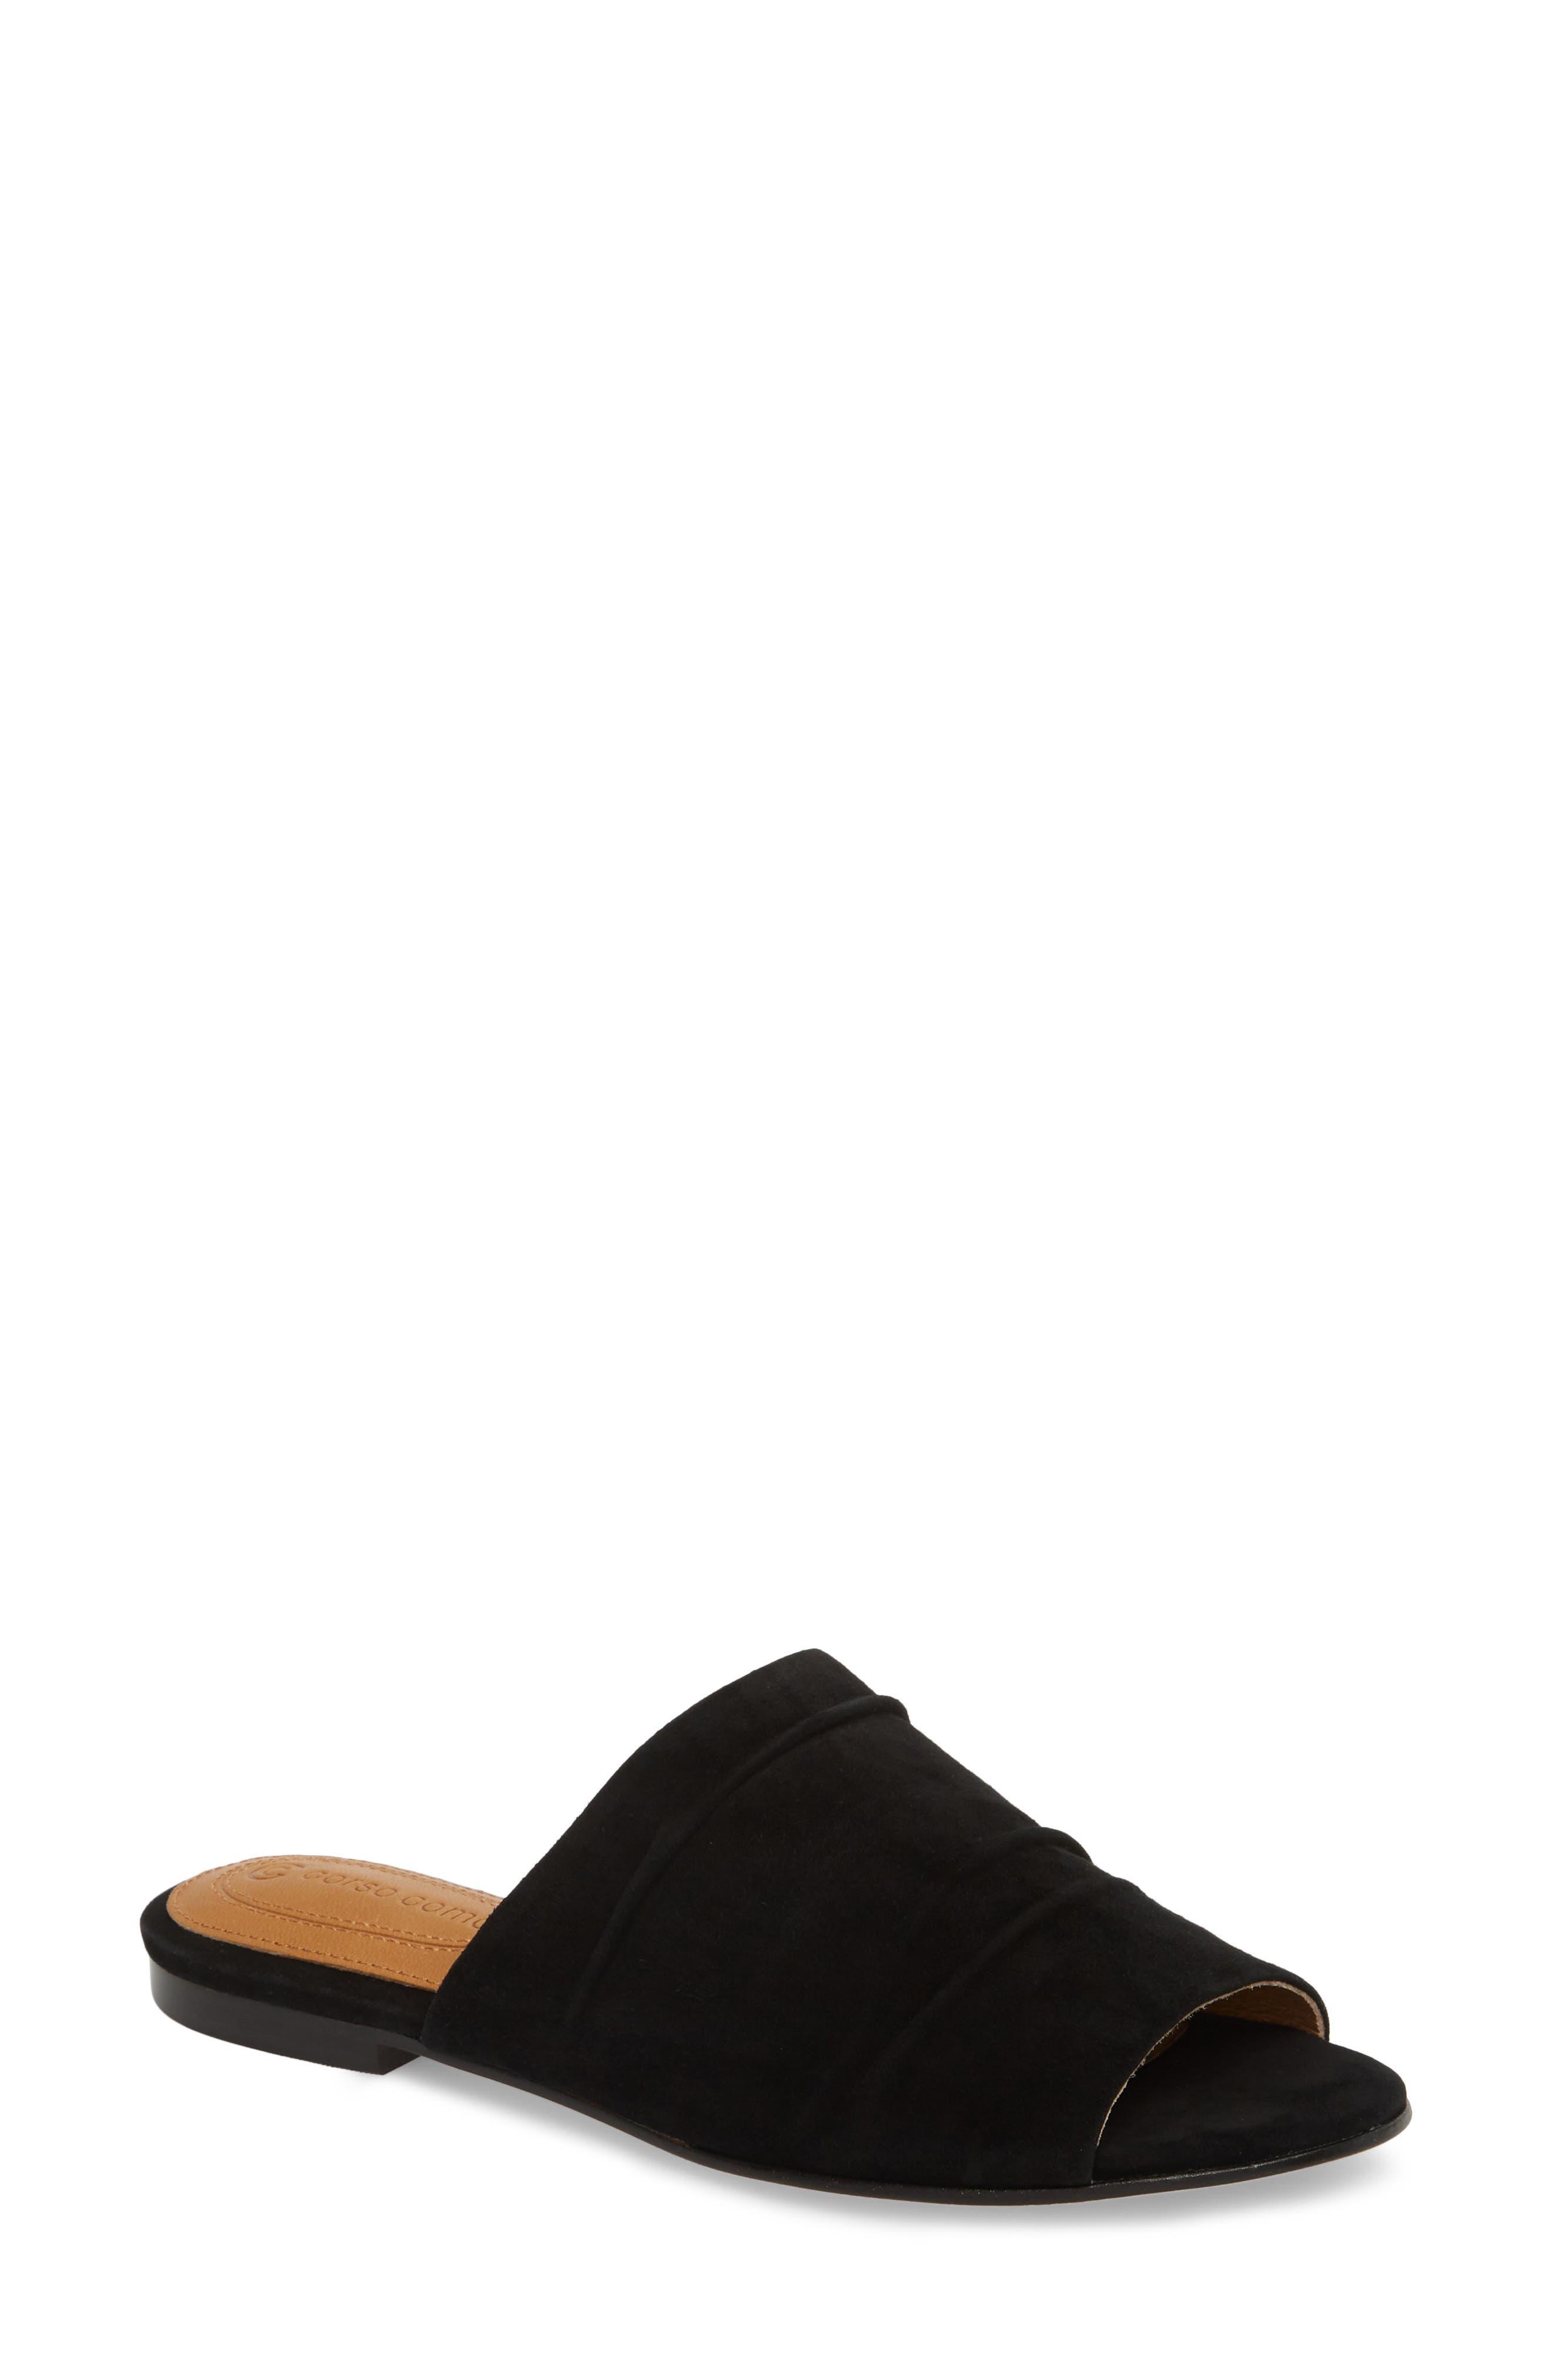 CC CORSO COMO<SUP>®</SUP> Beachaven Slide Sandal, Main, color, BLACK SUEDE